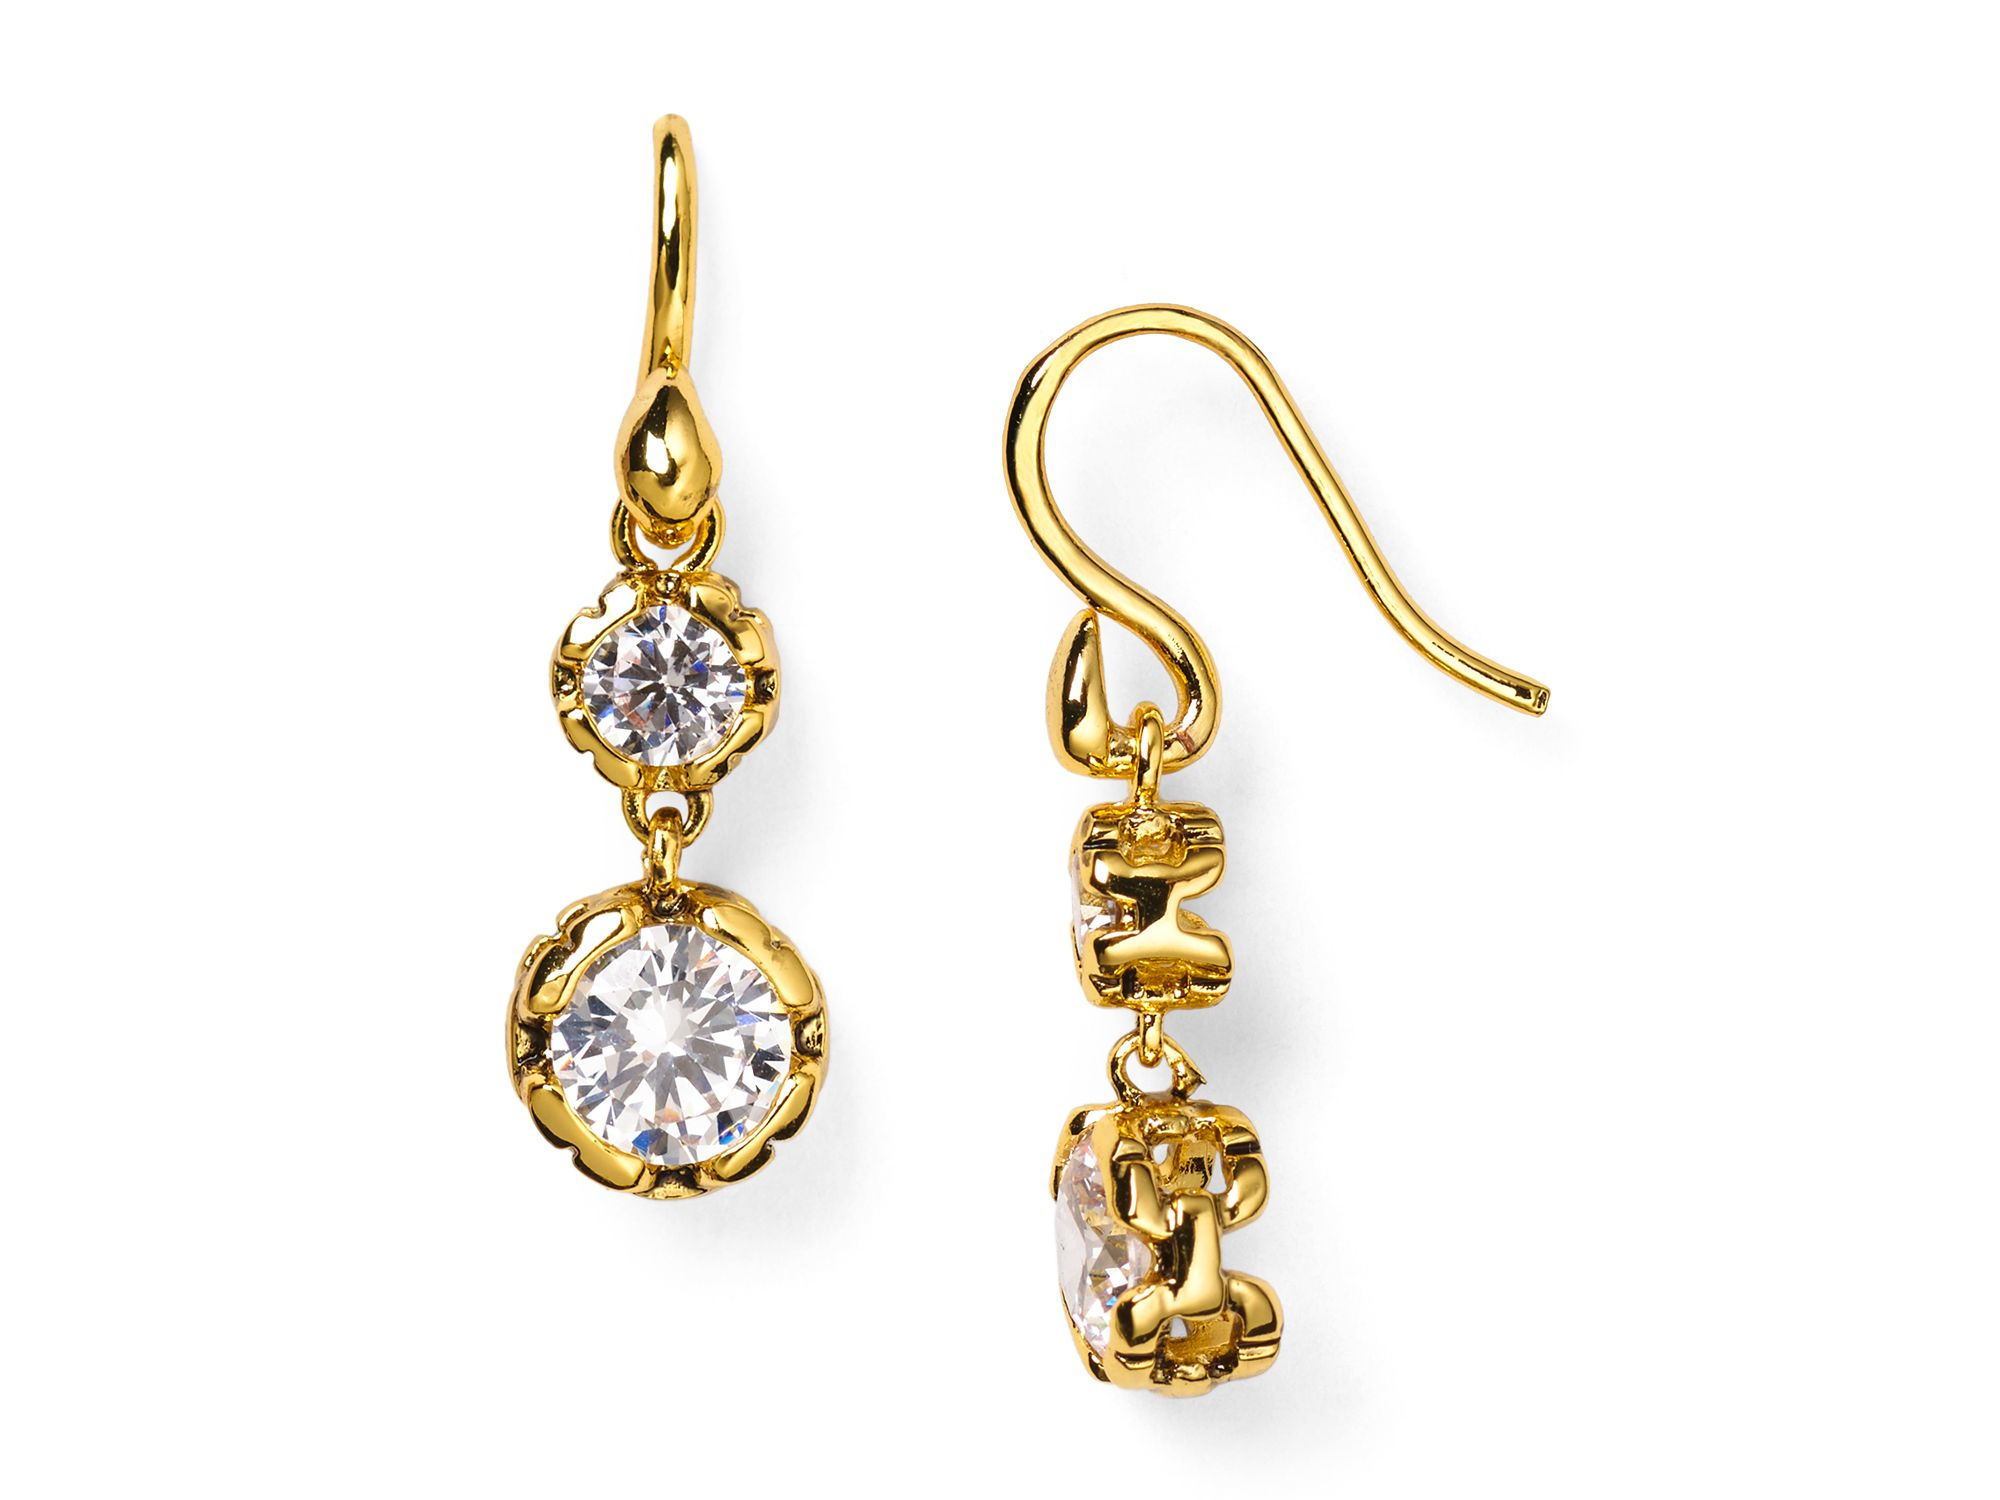 diane furstenberg cubic zirconia drop earrings in gold